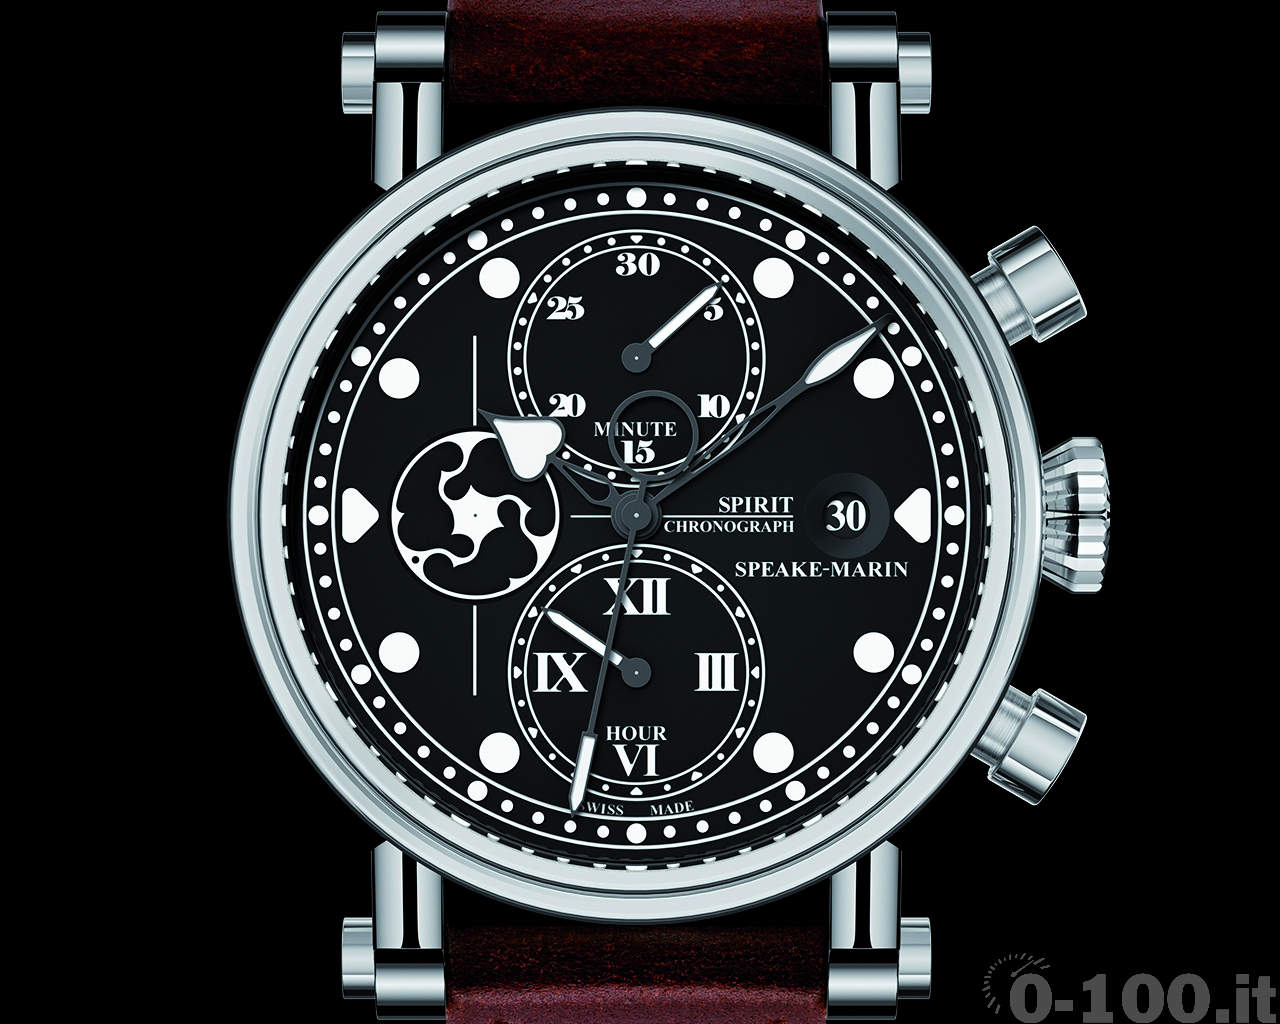 anteprima-baselworld-2014-speake-marin-spirit-seafire-cronograph-prezzo-price_0-1002